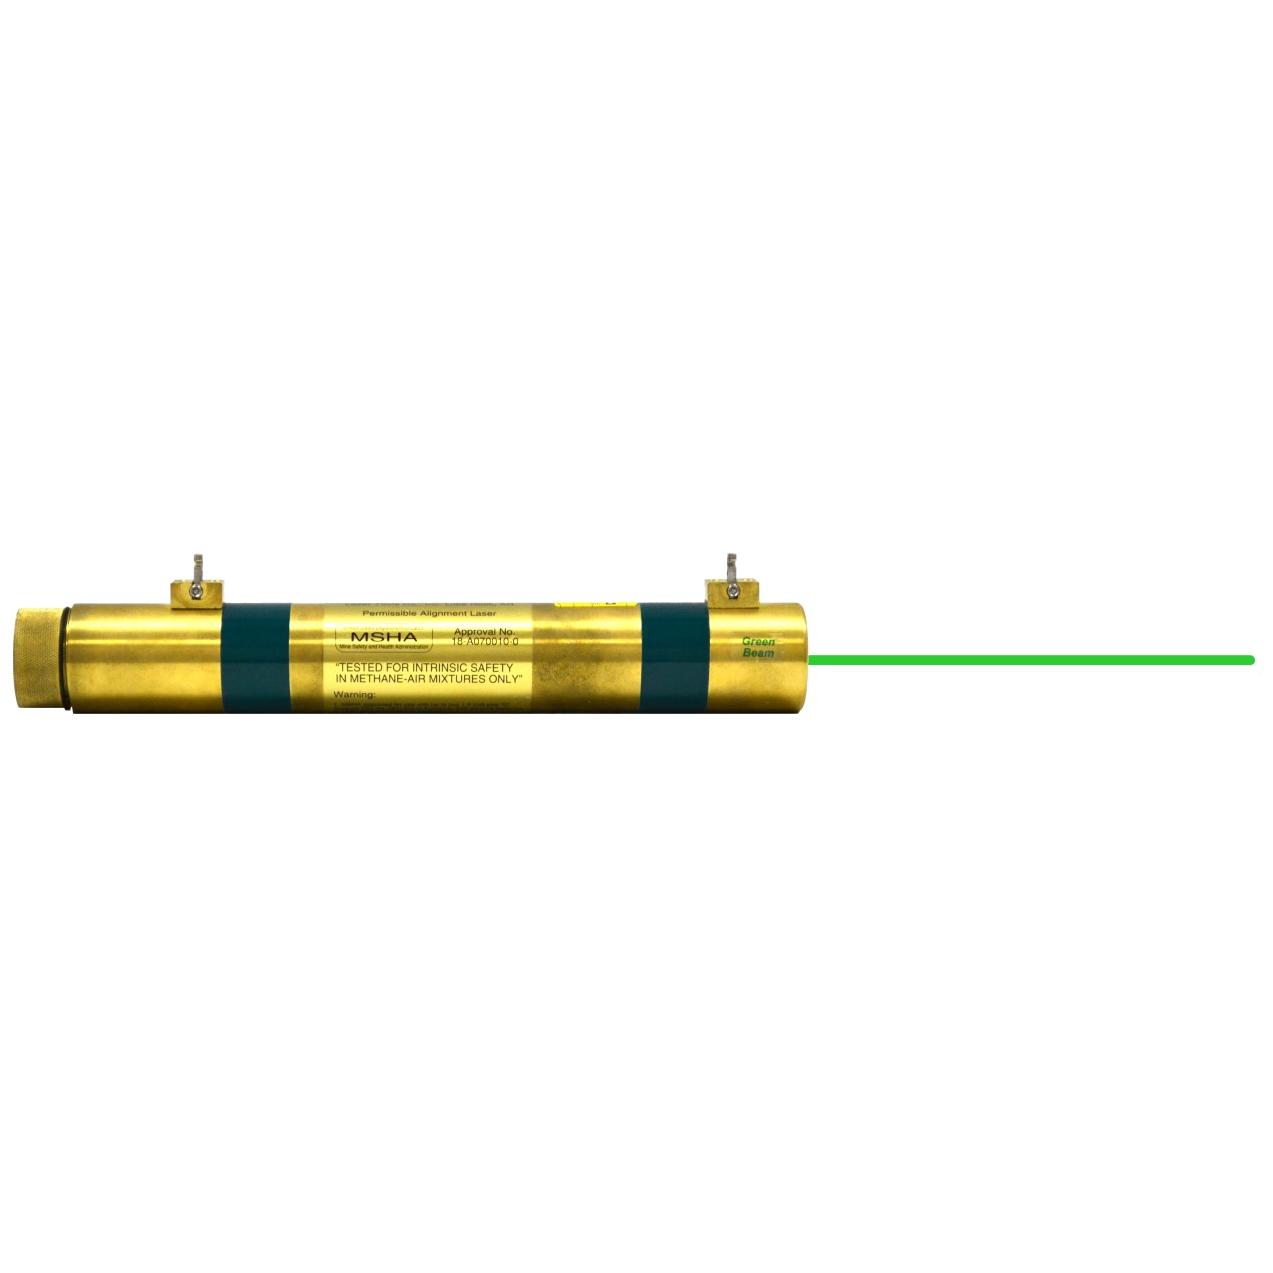 Green Msha Mining Alignment Laser Long Range 40 6262